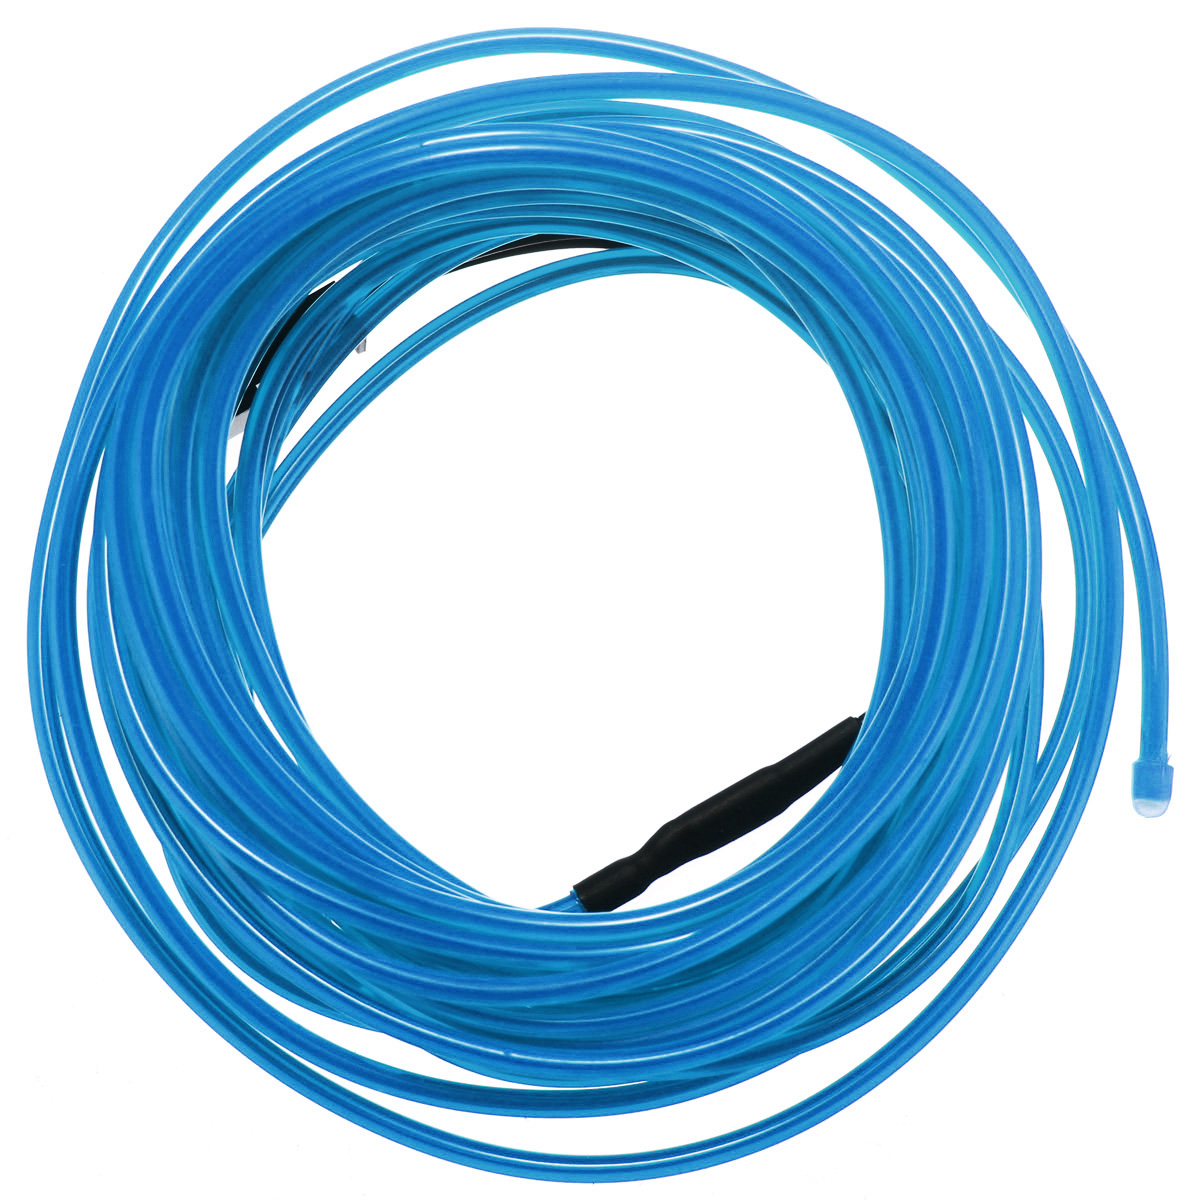 5M EL Wire w Battery-powered Controller Neon Light Flexible Blue ...